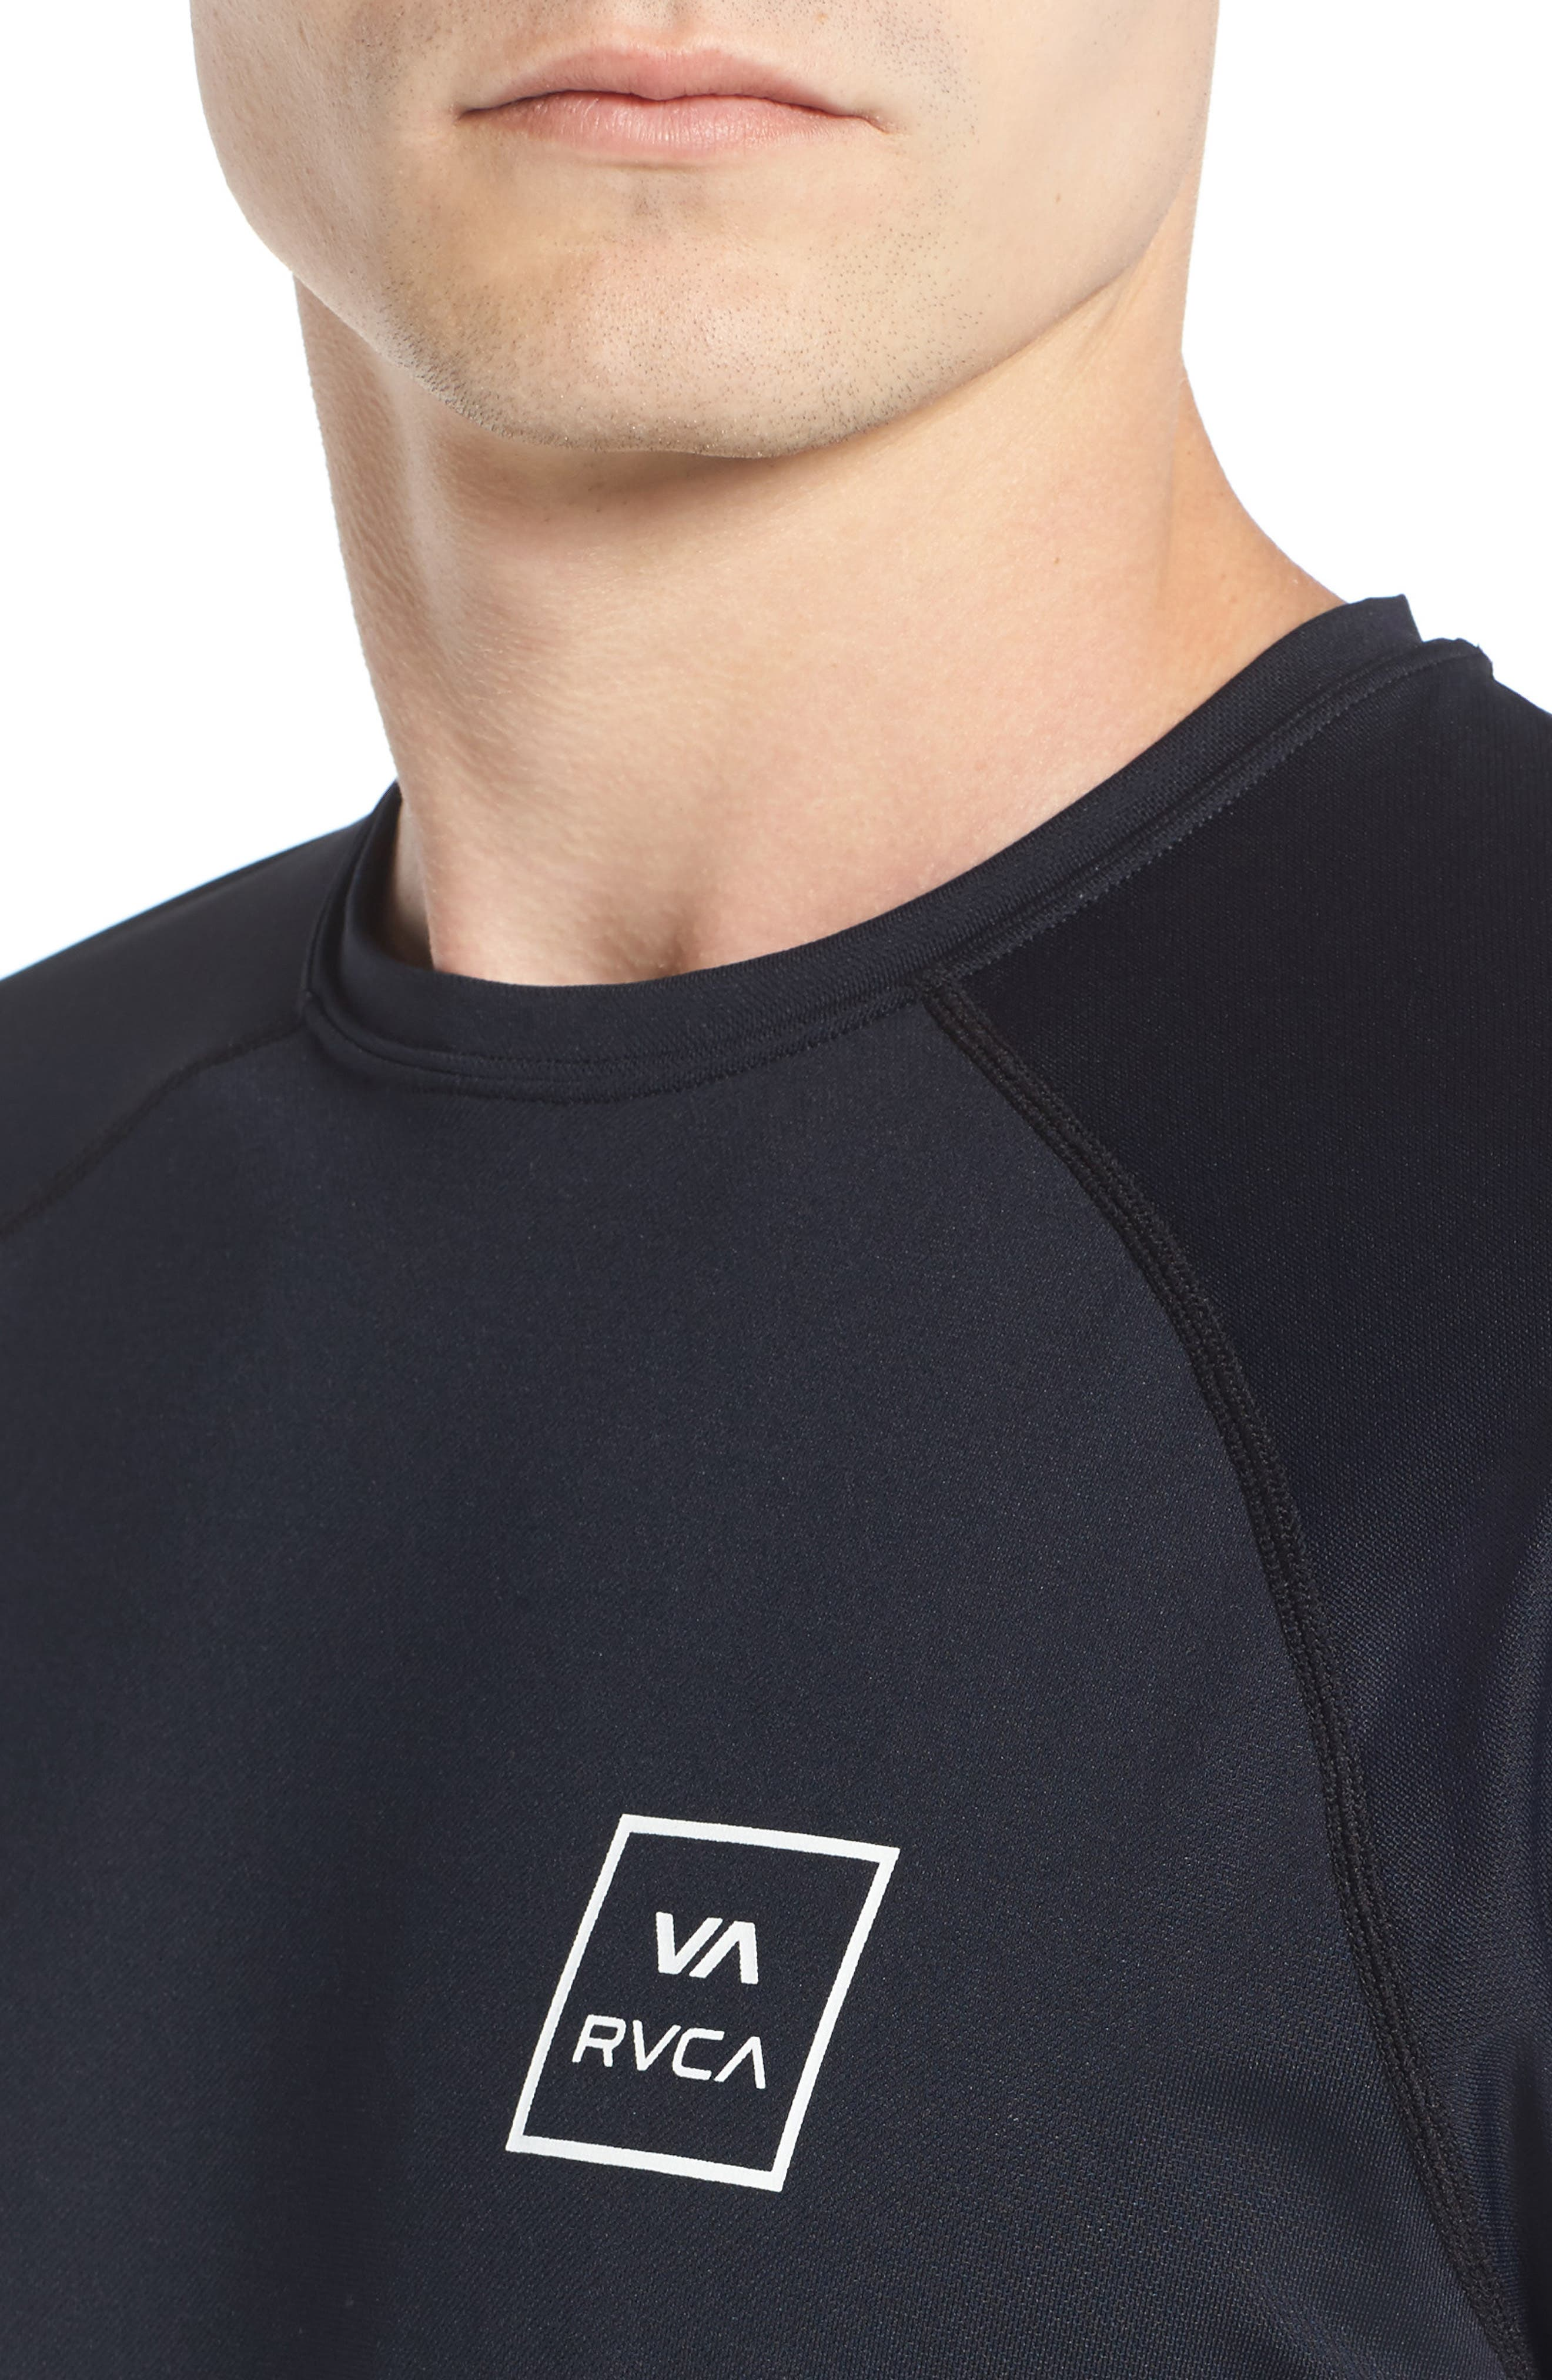 VA All the Way Surf T-Shirt,                             Alternate thumbnail 4, color,                             Black